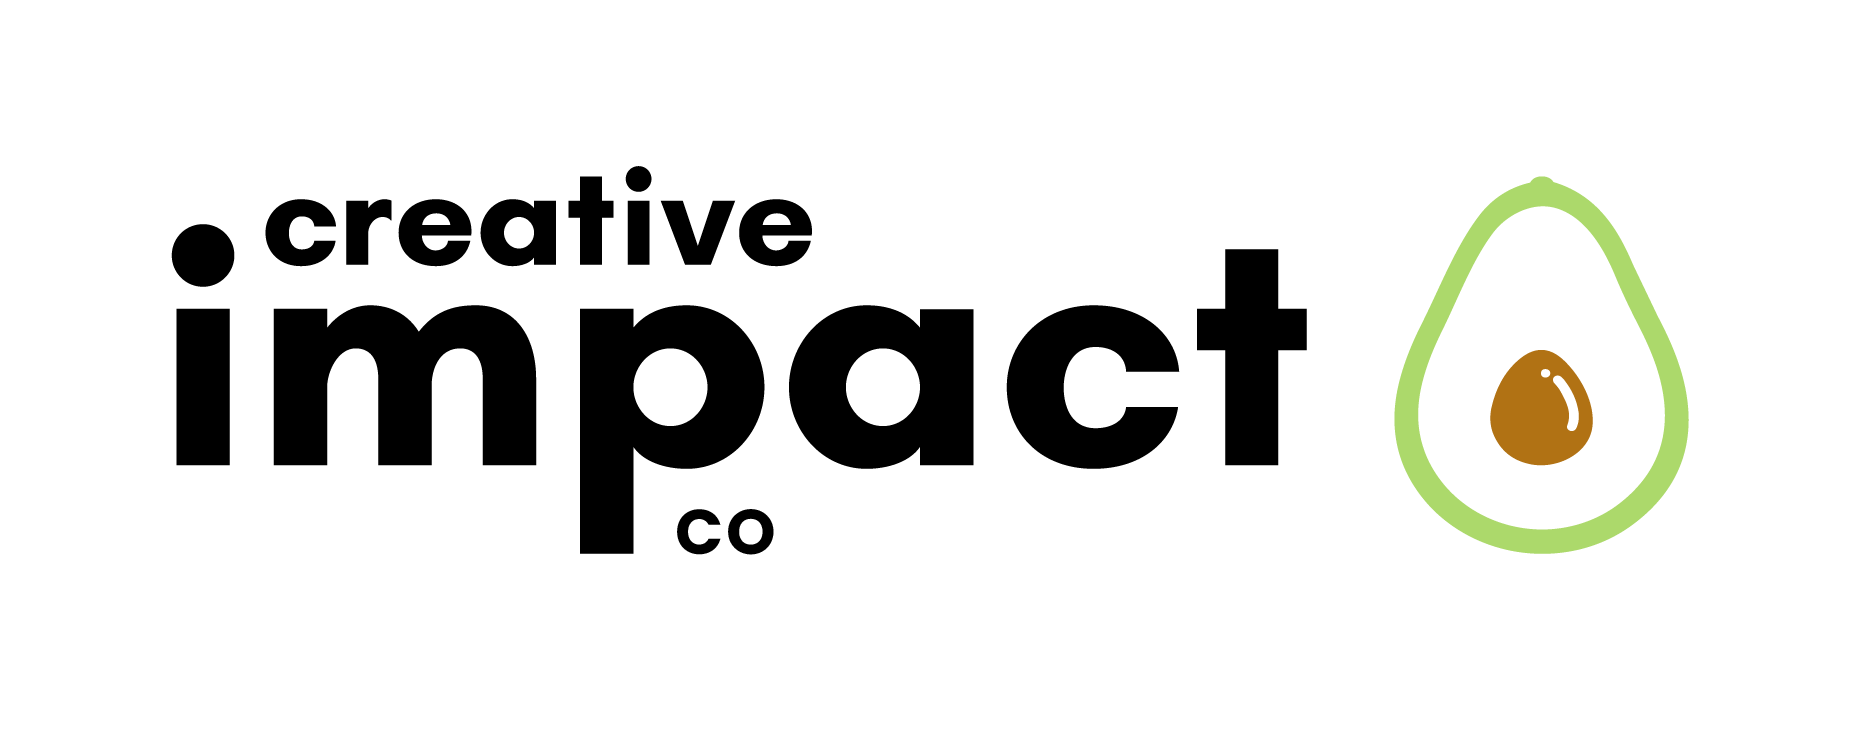 Creative Impact logo